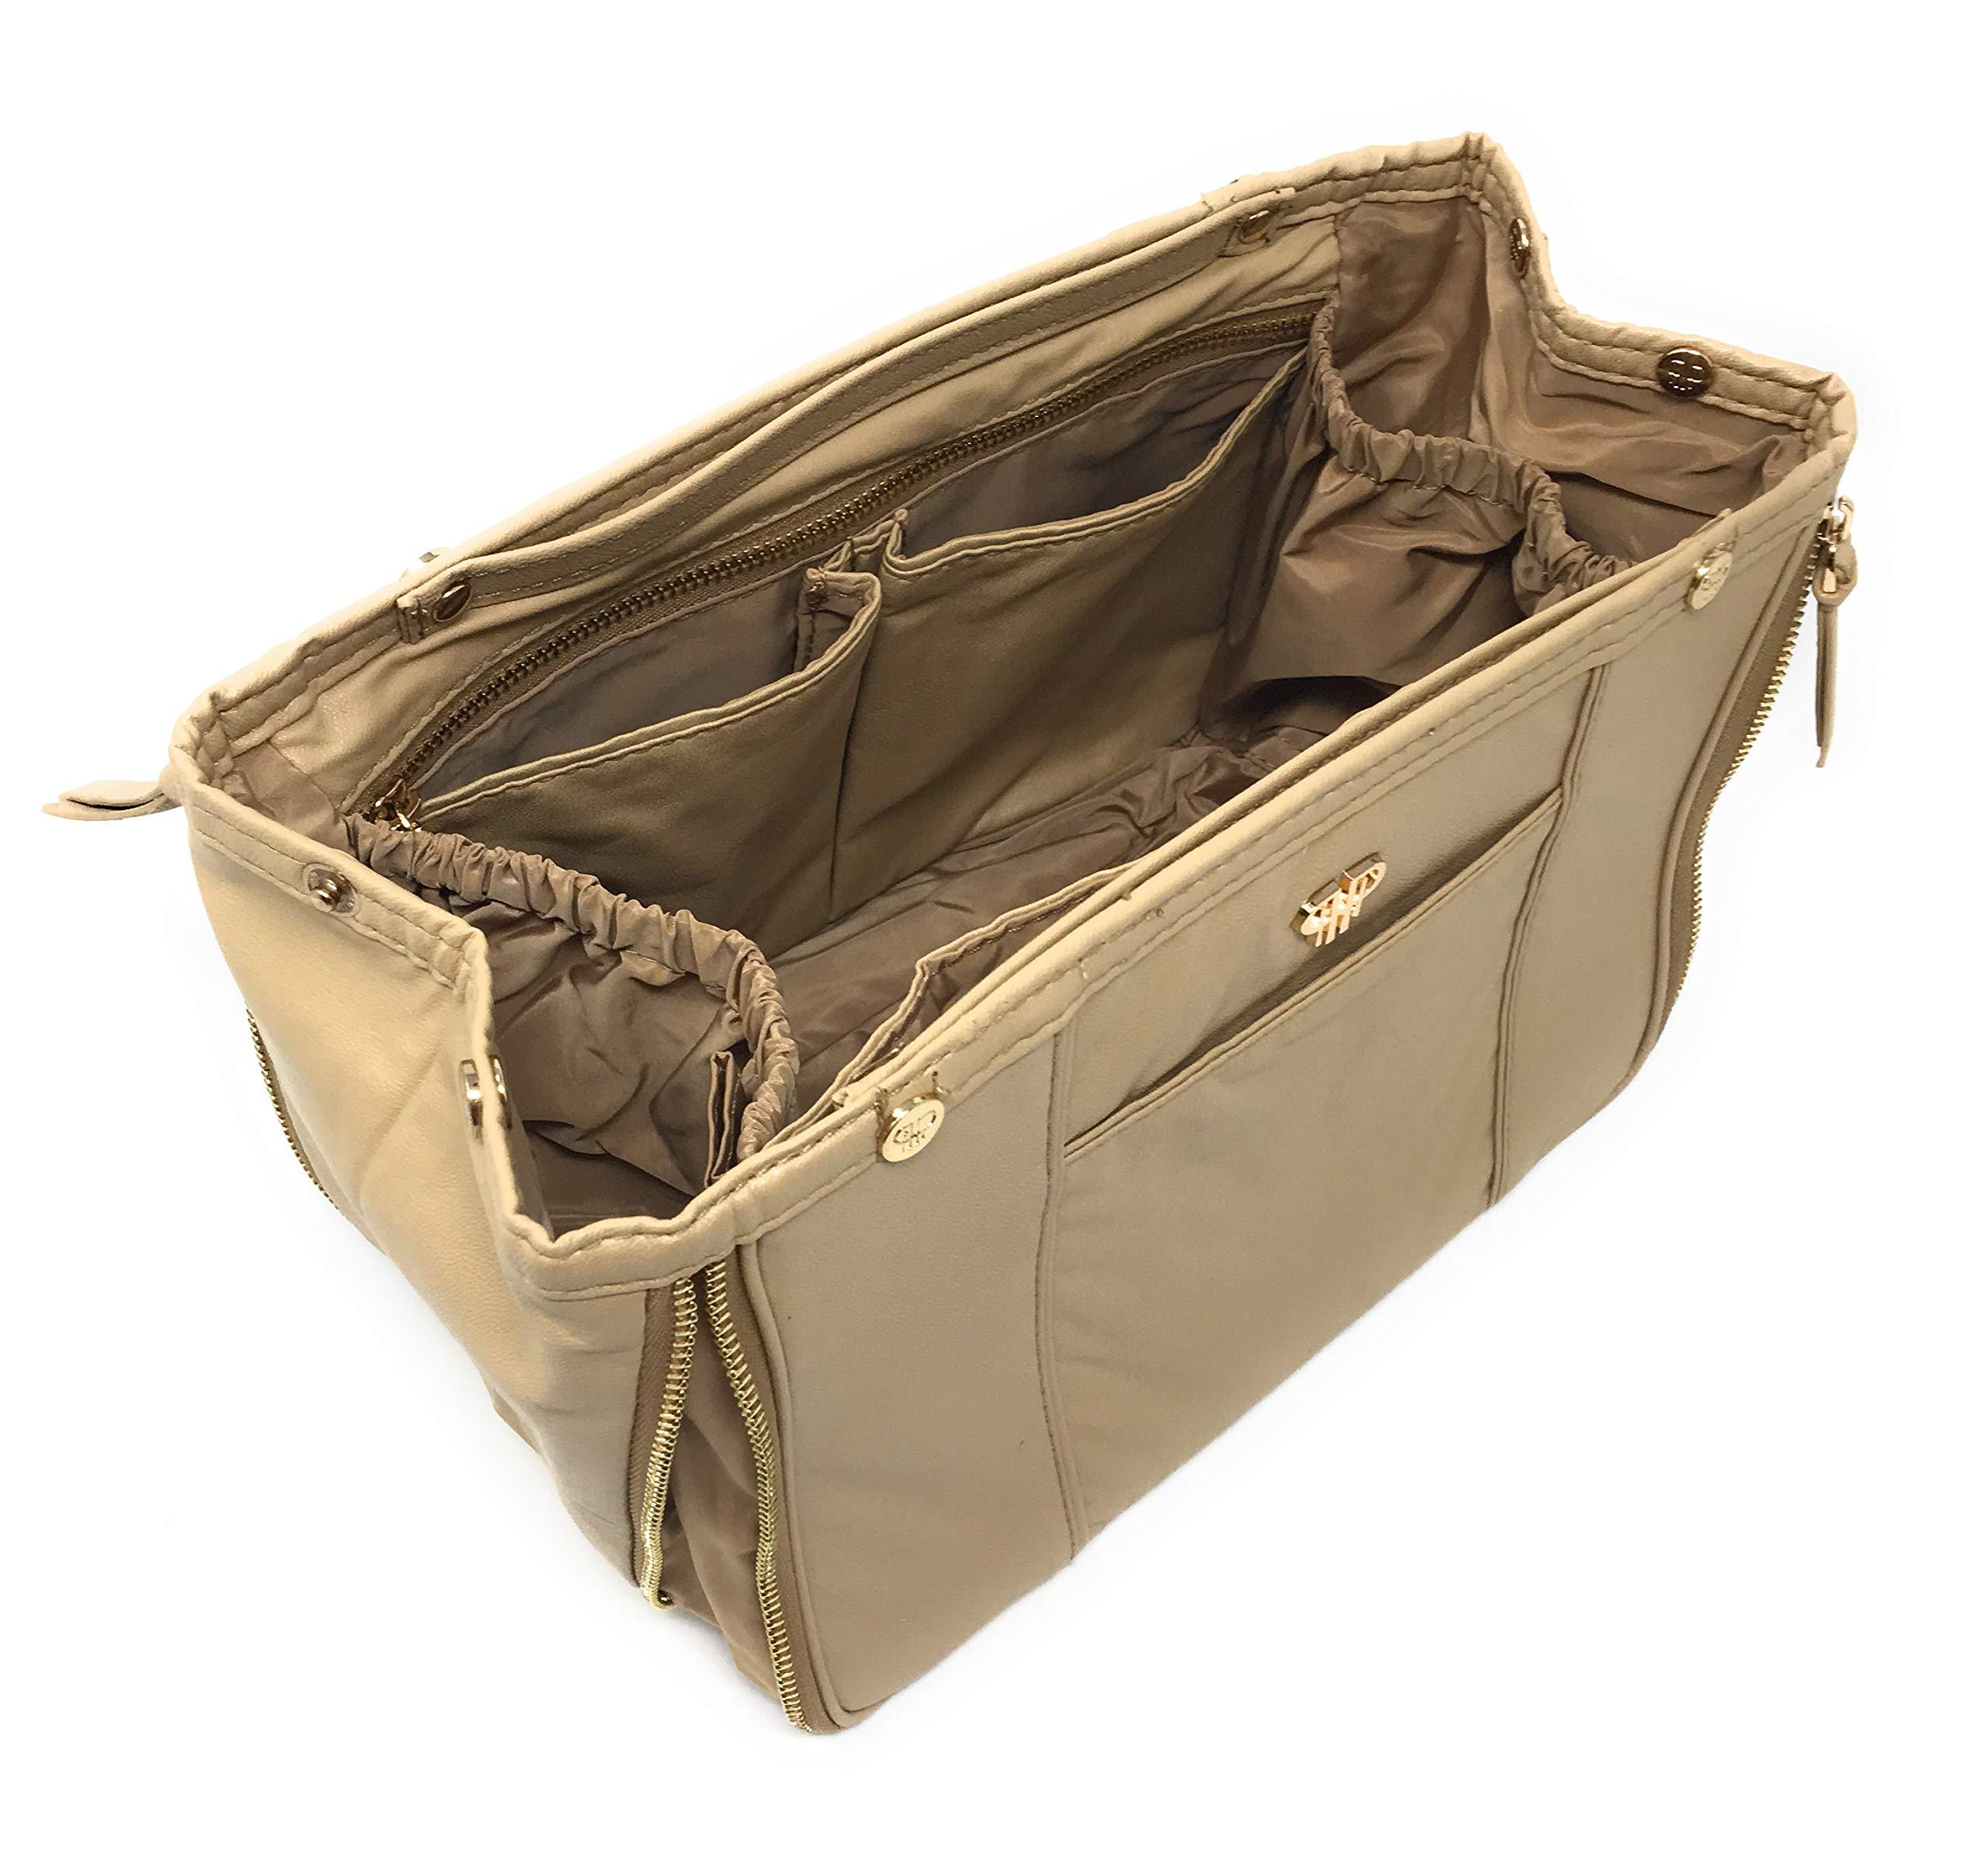 PurseN Handbag Organizer Purse Bag Liner Expandable Insert (Small, Nude)